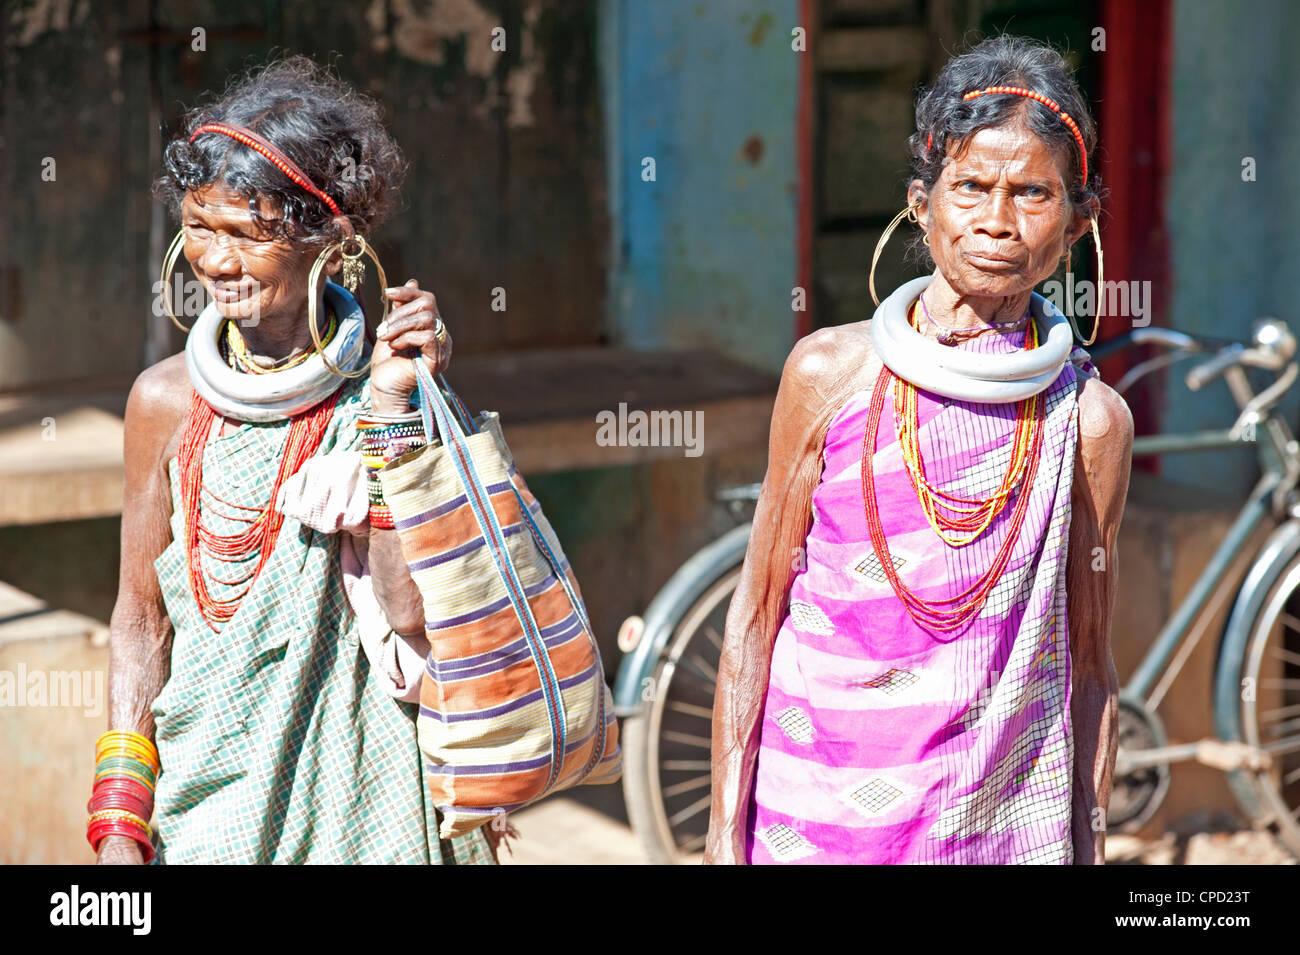 Two Gadaba tribeswomen each with traditional jewellery, Rayagader, Orissa, India - Stock Image